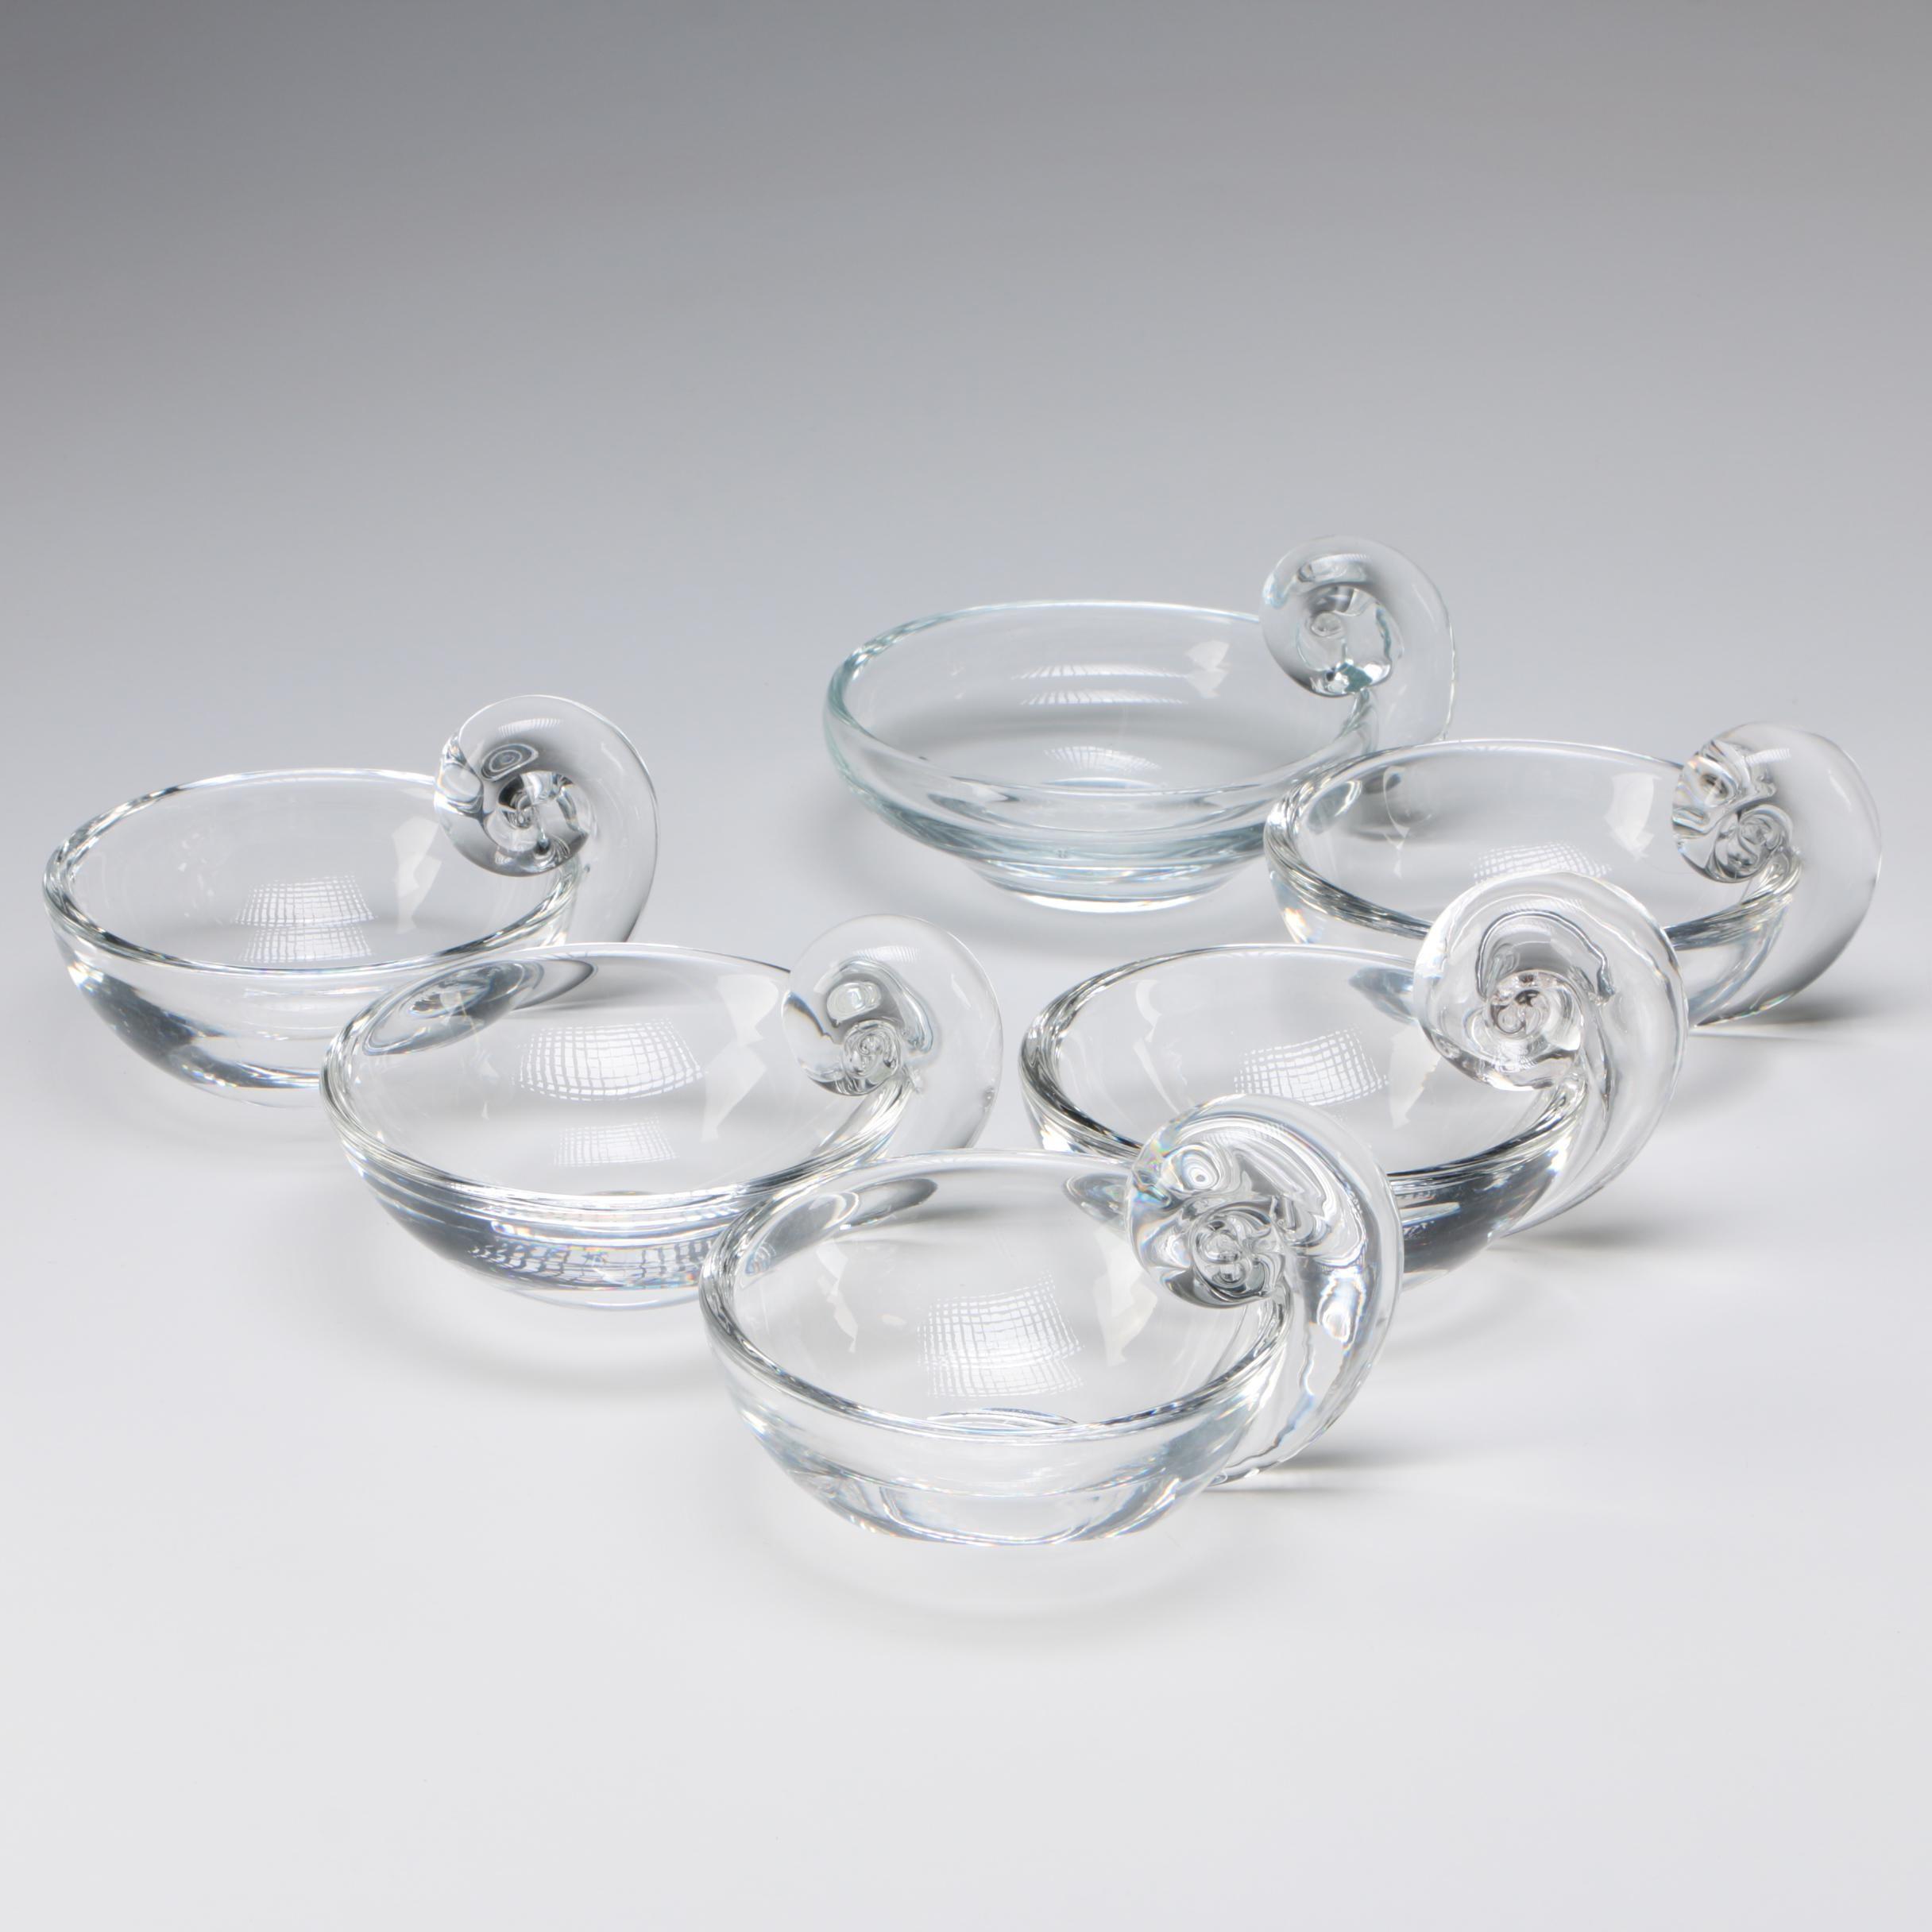 "Steuben Art Glass ""Olive Dishes"" by John Dreves, After 1939"